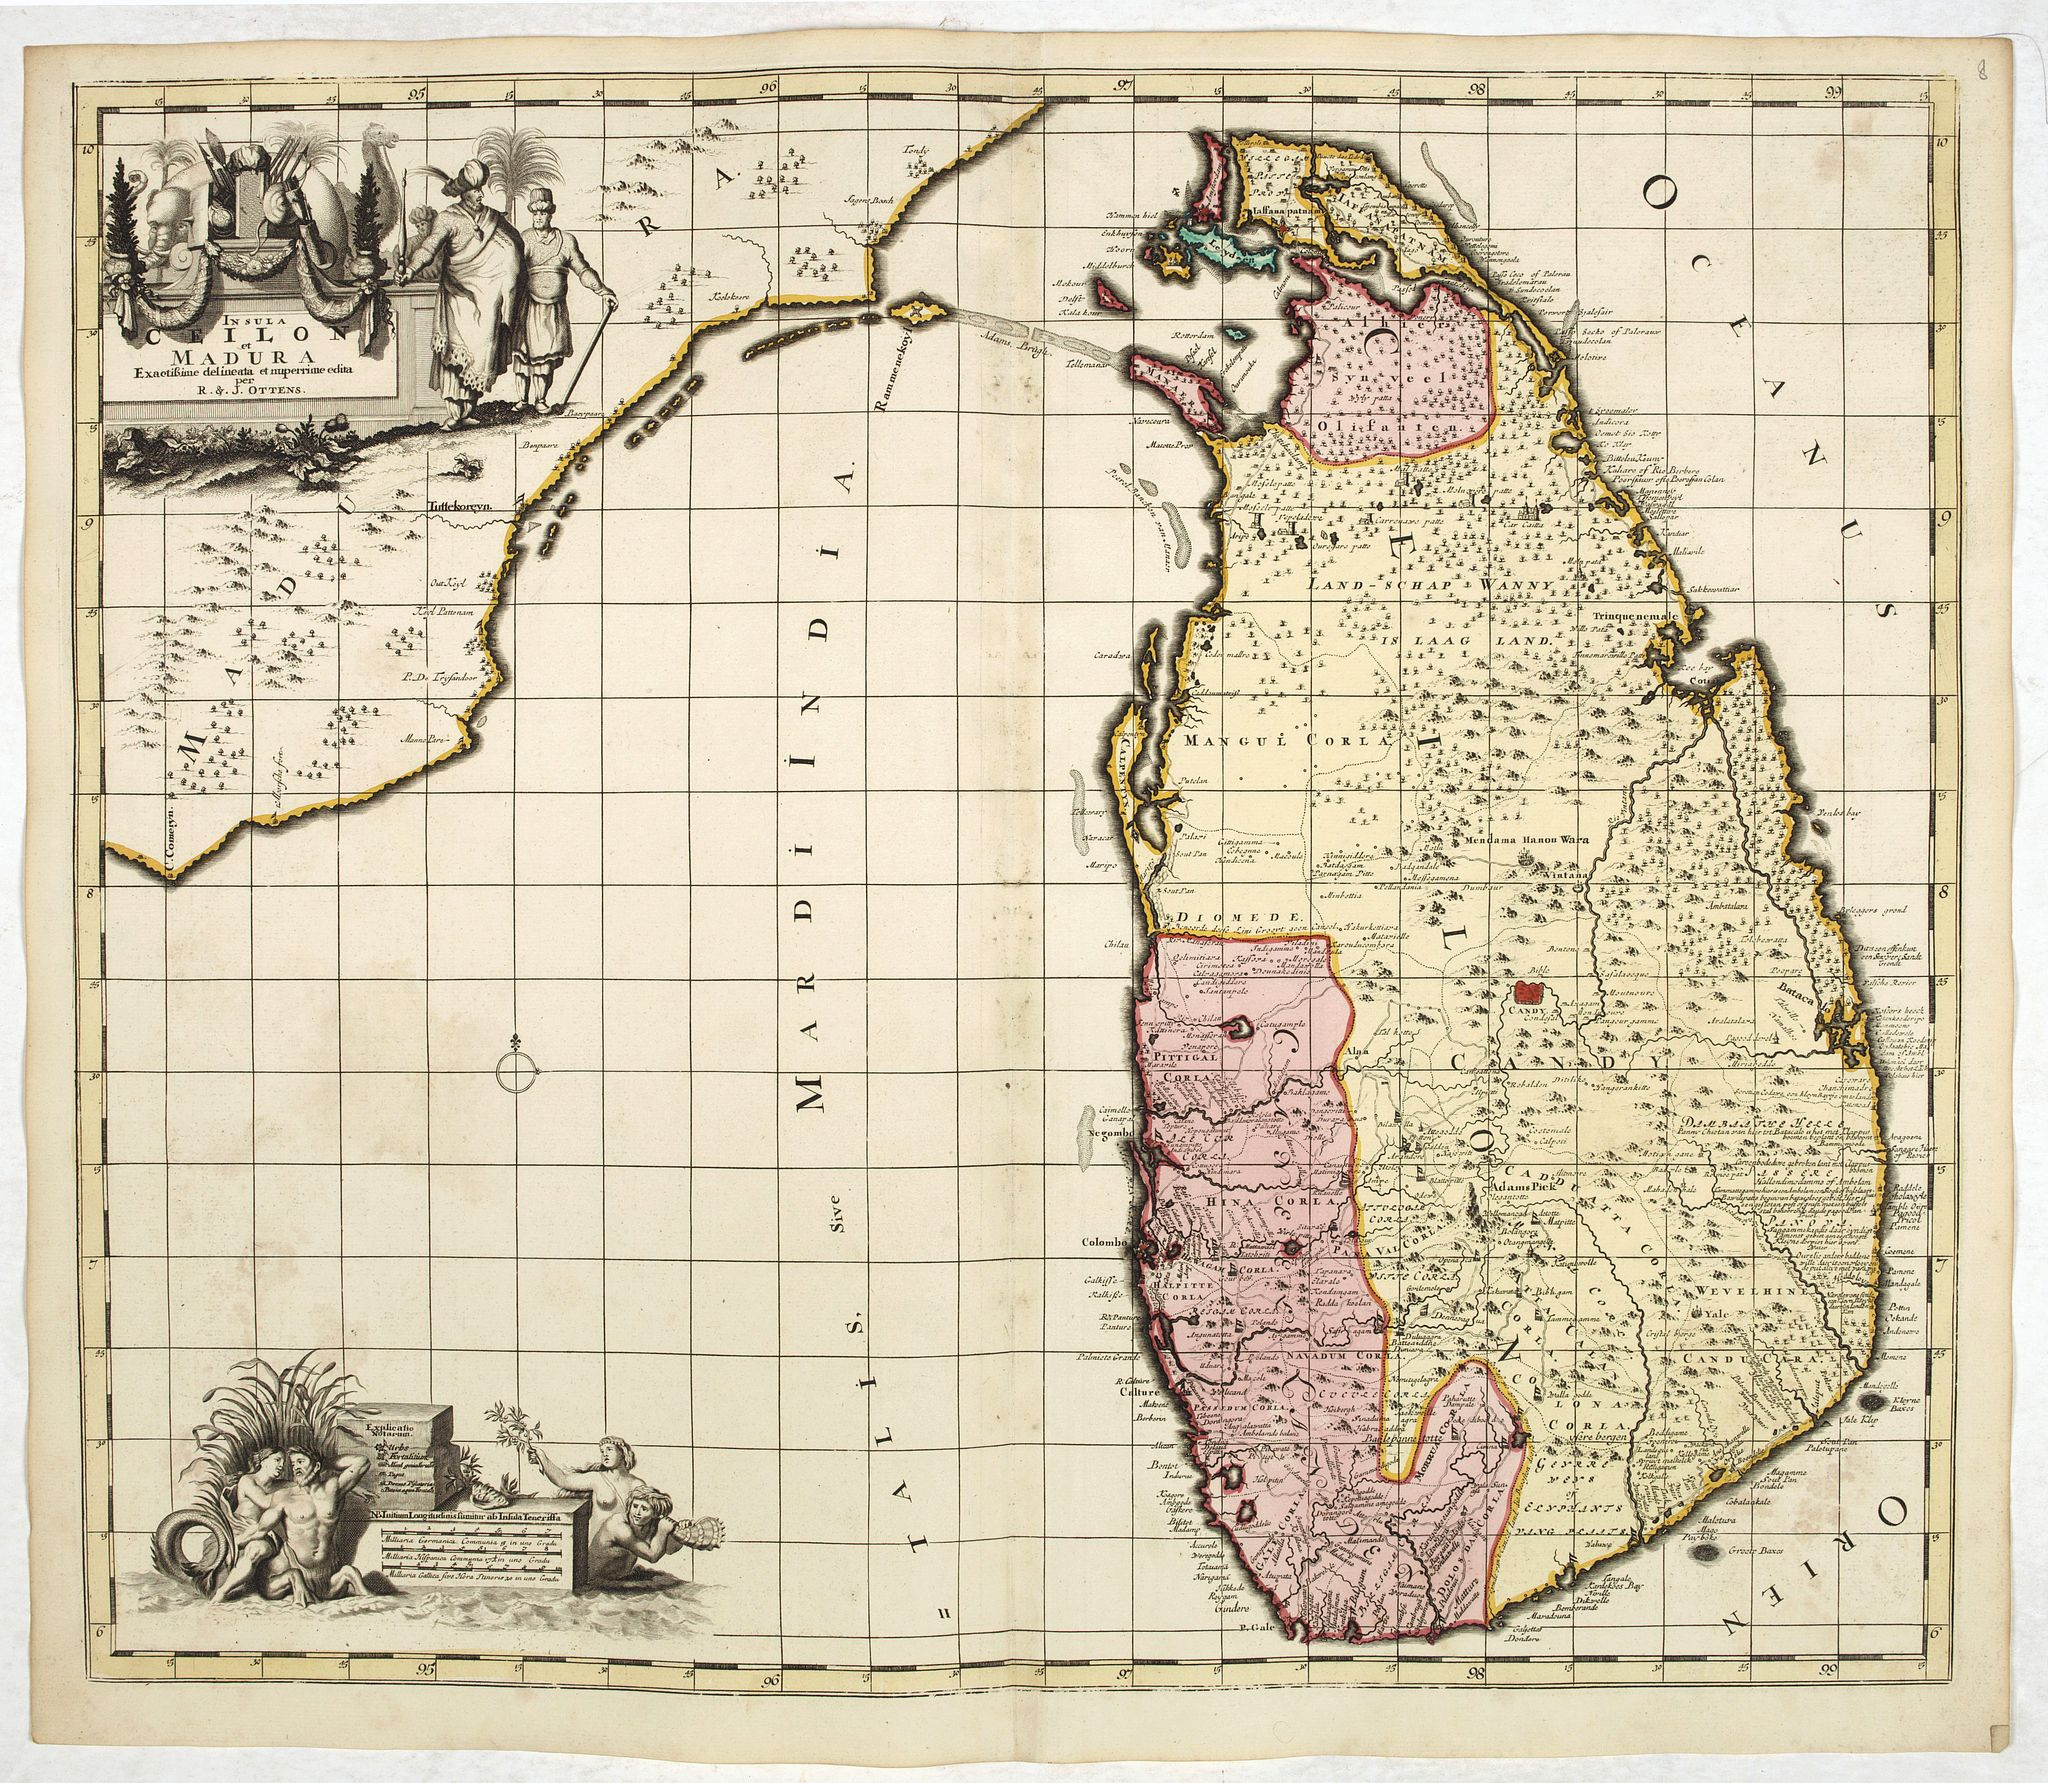 OTTENS, R. & J. -  Insula Ceilon et Madura / Exactissime delineata et nuperrime edita per R. & J. Ottens.